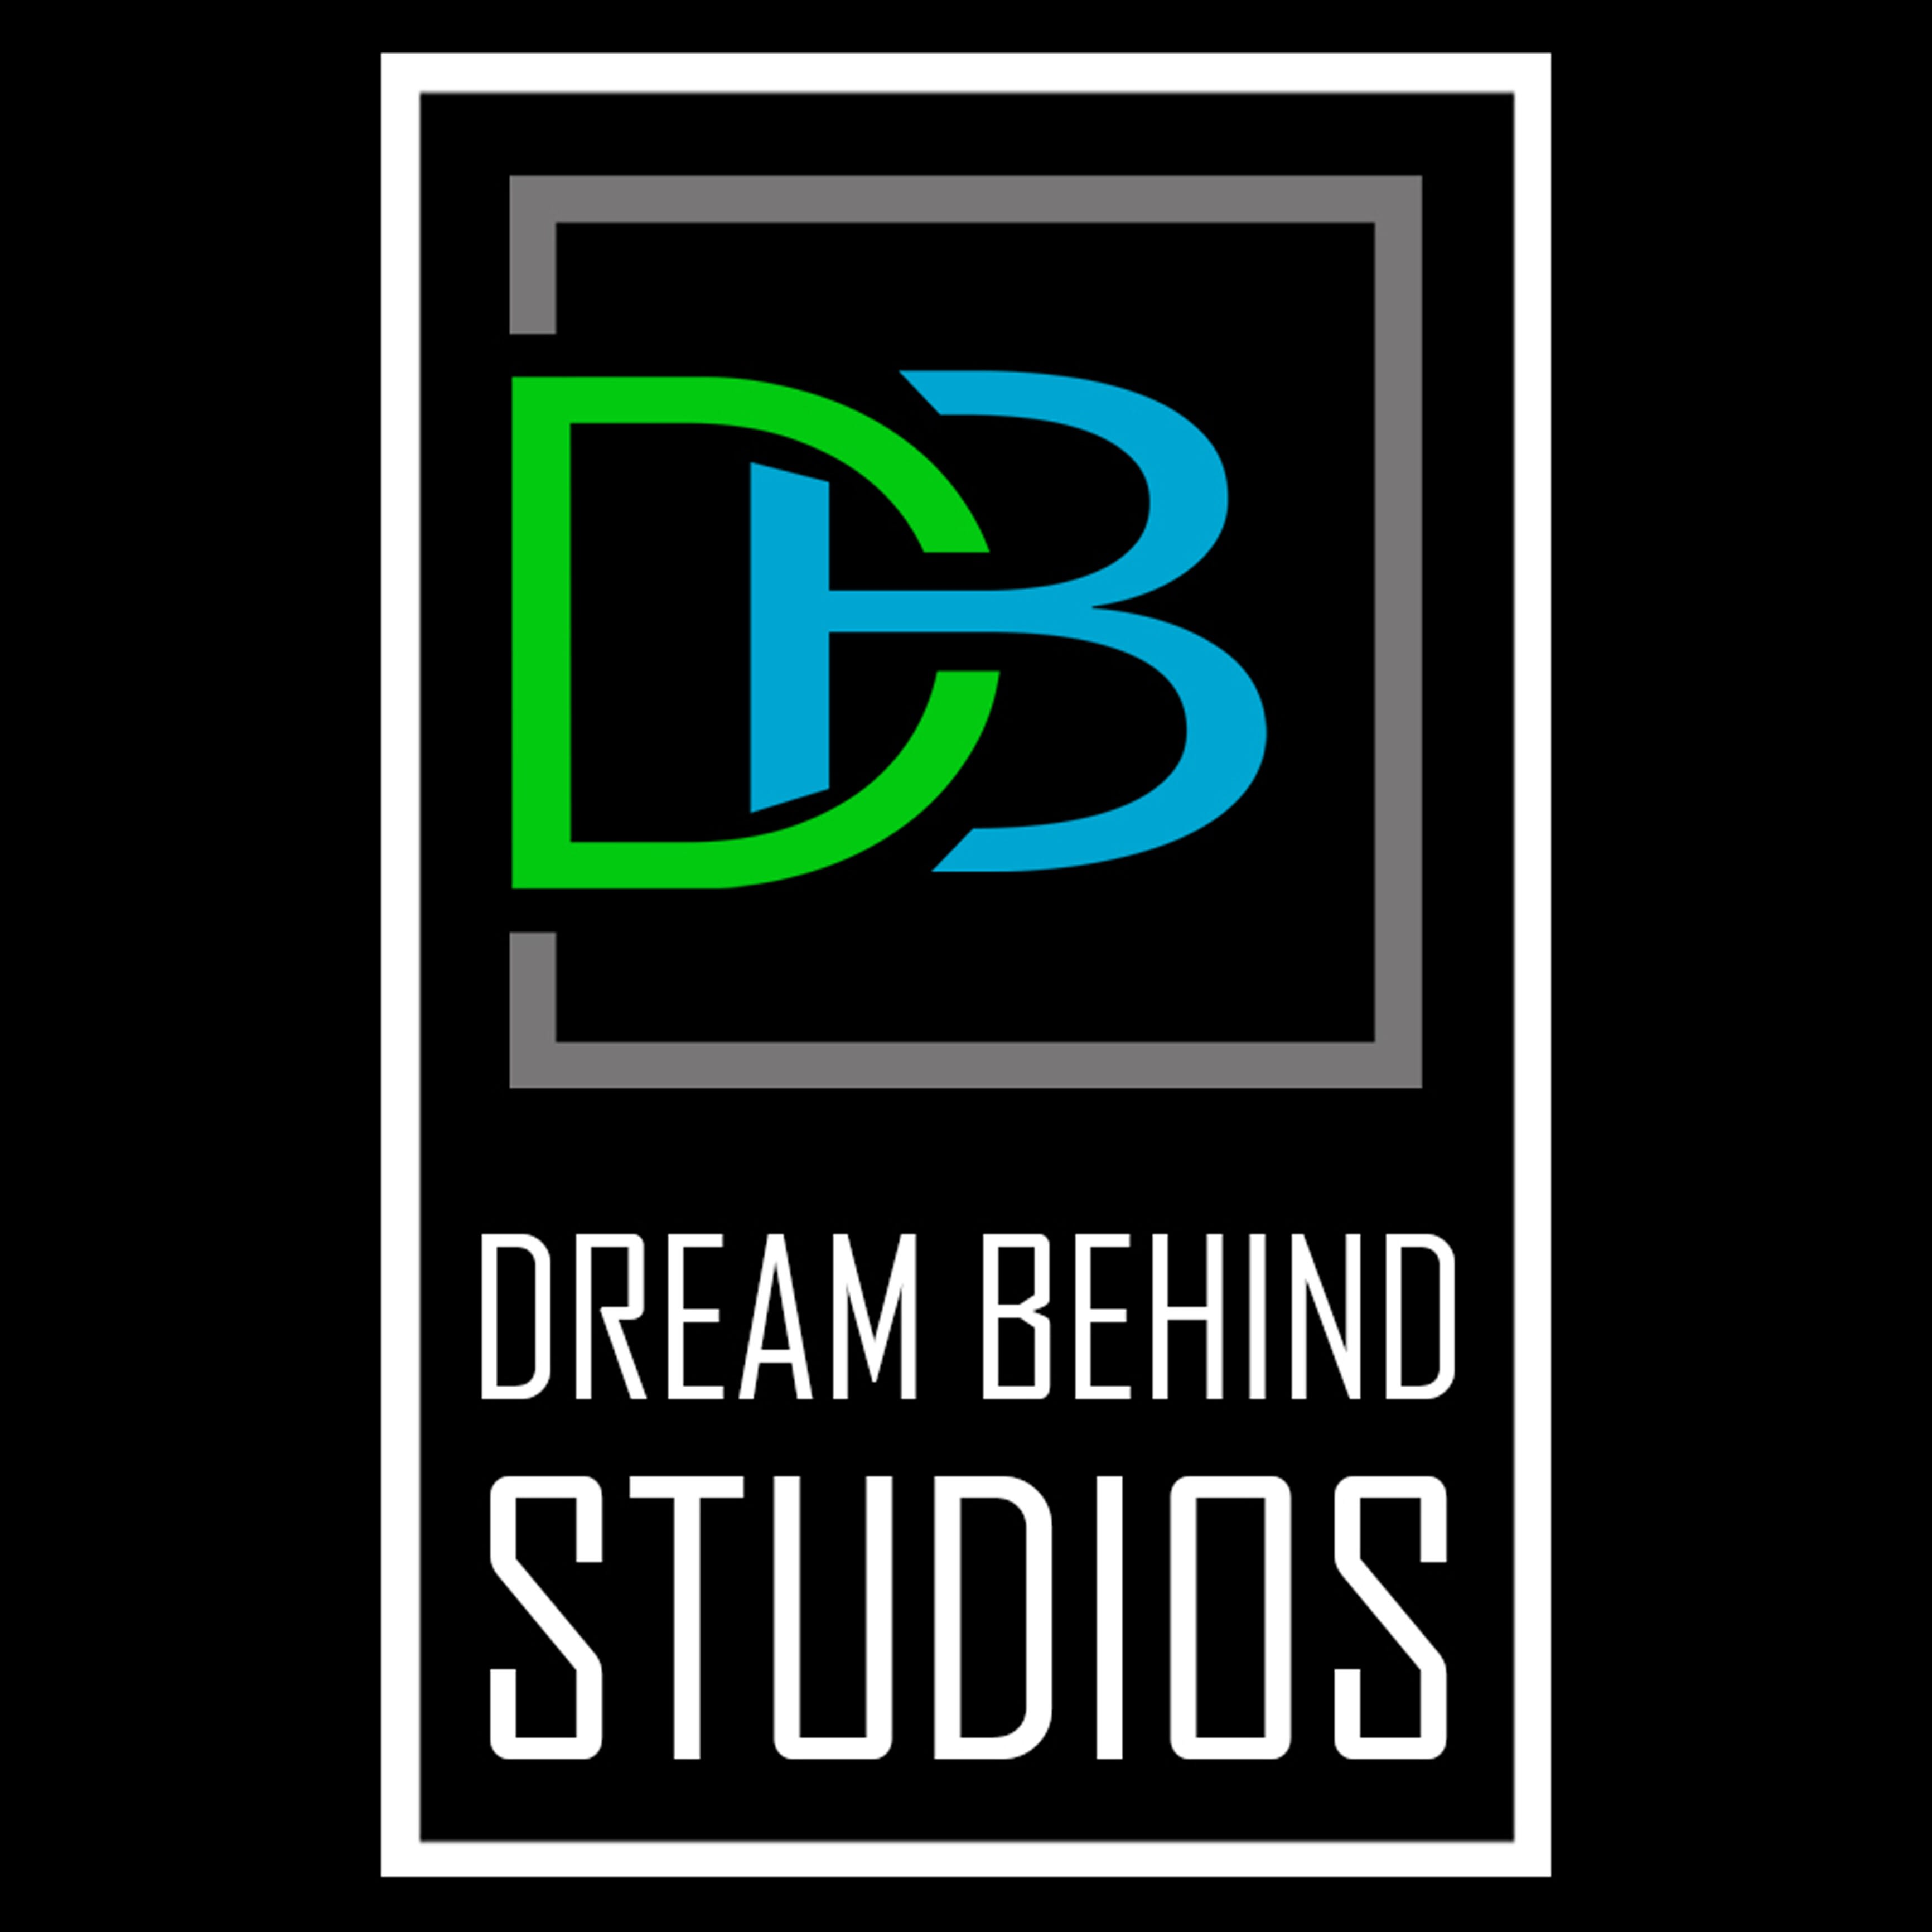 Dream Behind Studios